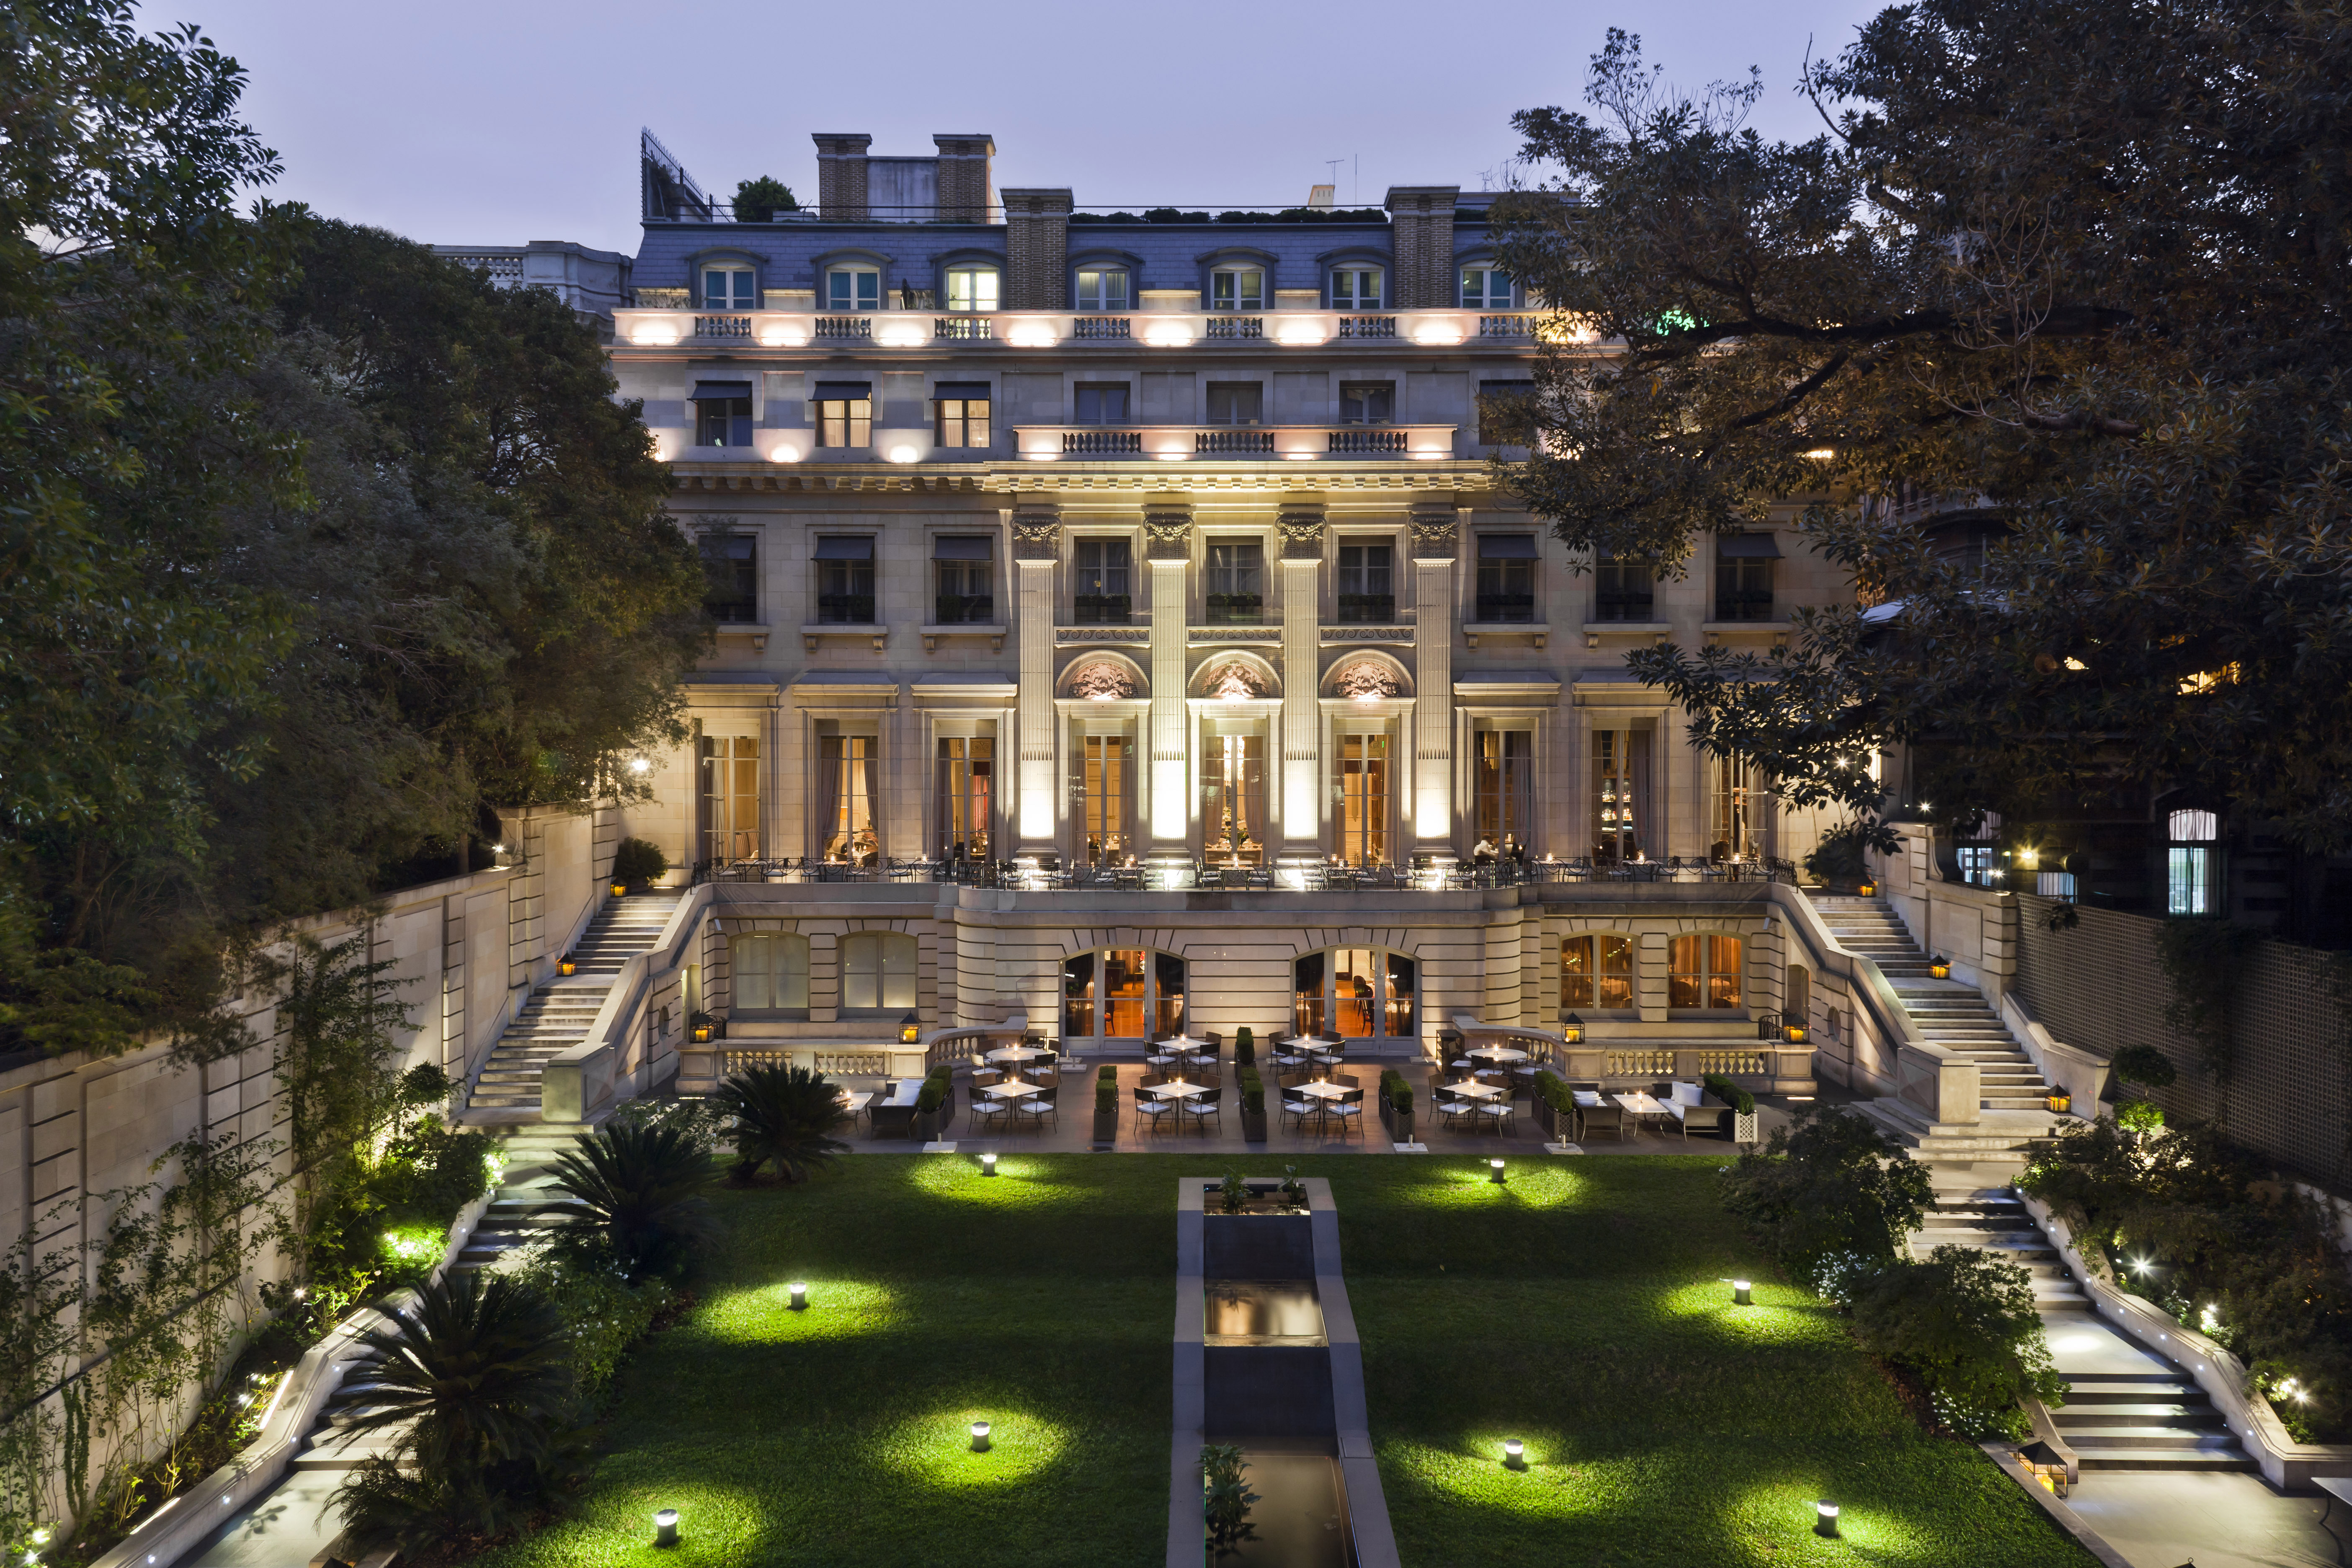 Palacio Duhau – Park Hyatt Buenos Aires, Argentina